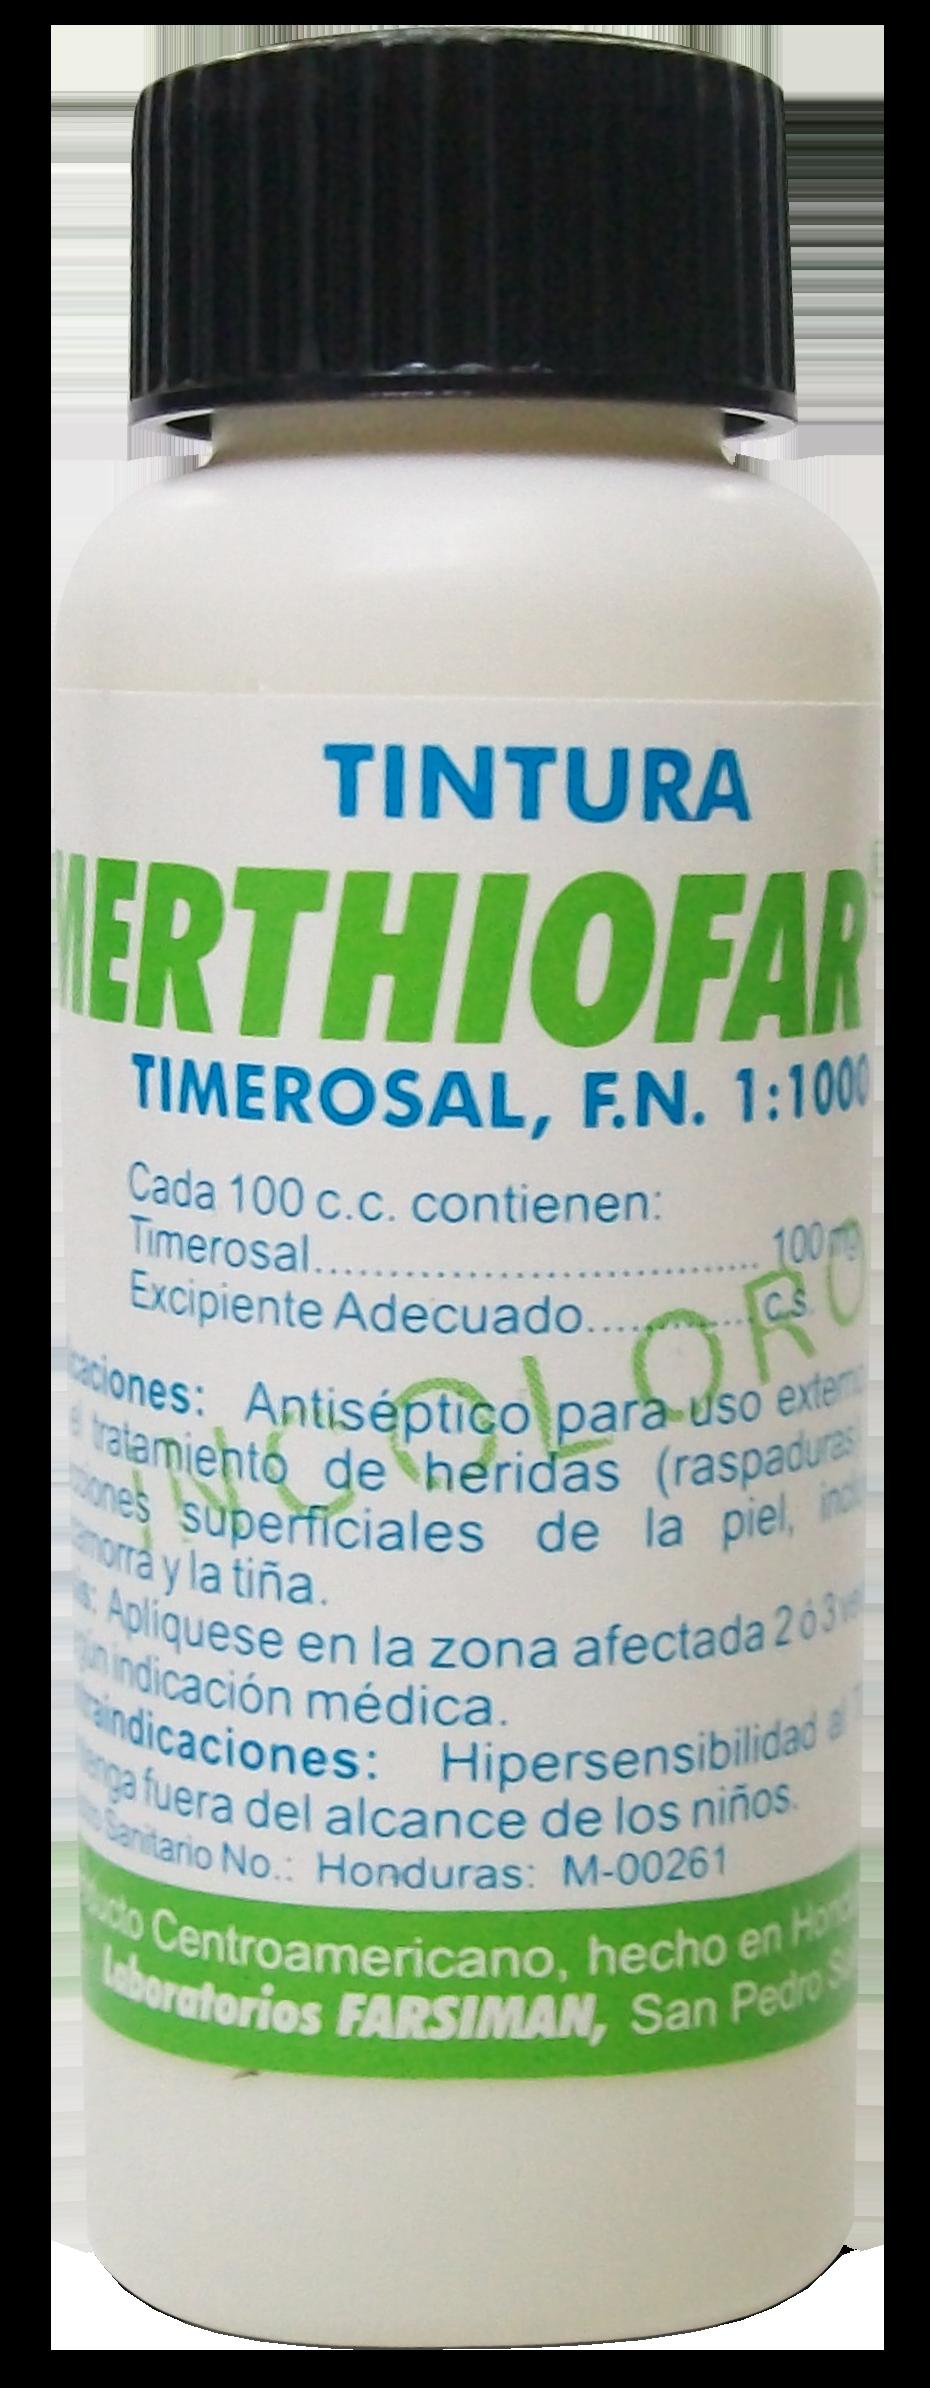 Tintura Merthiofar.png